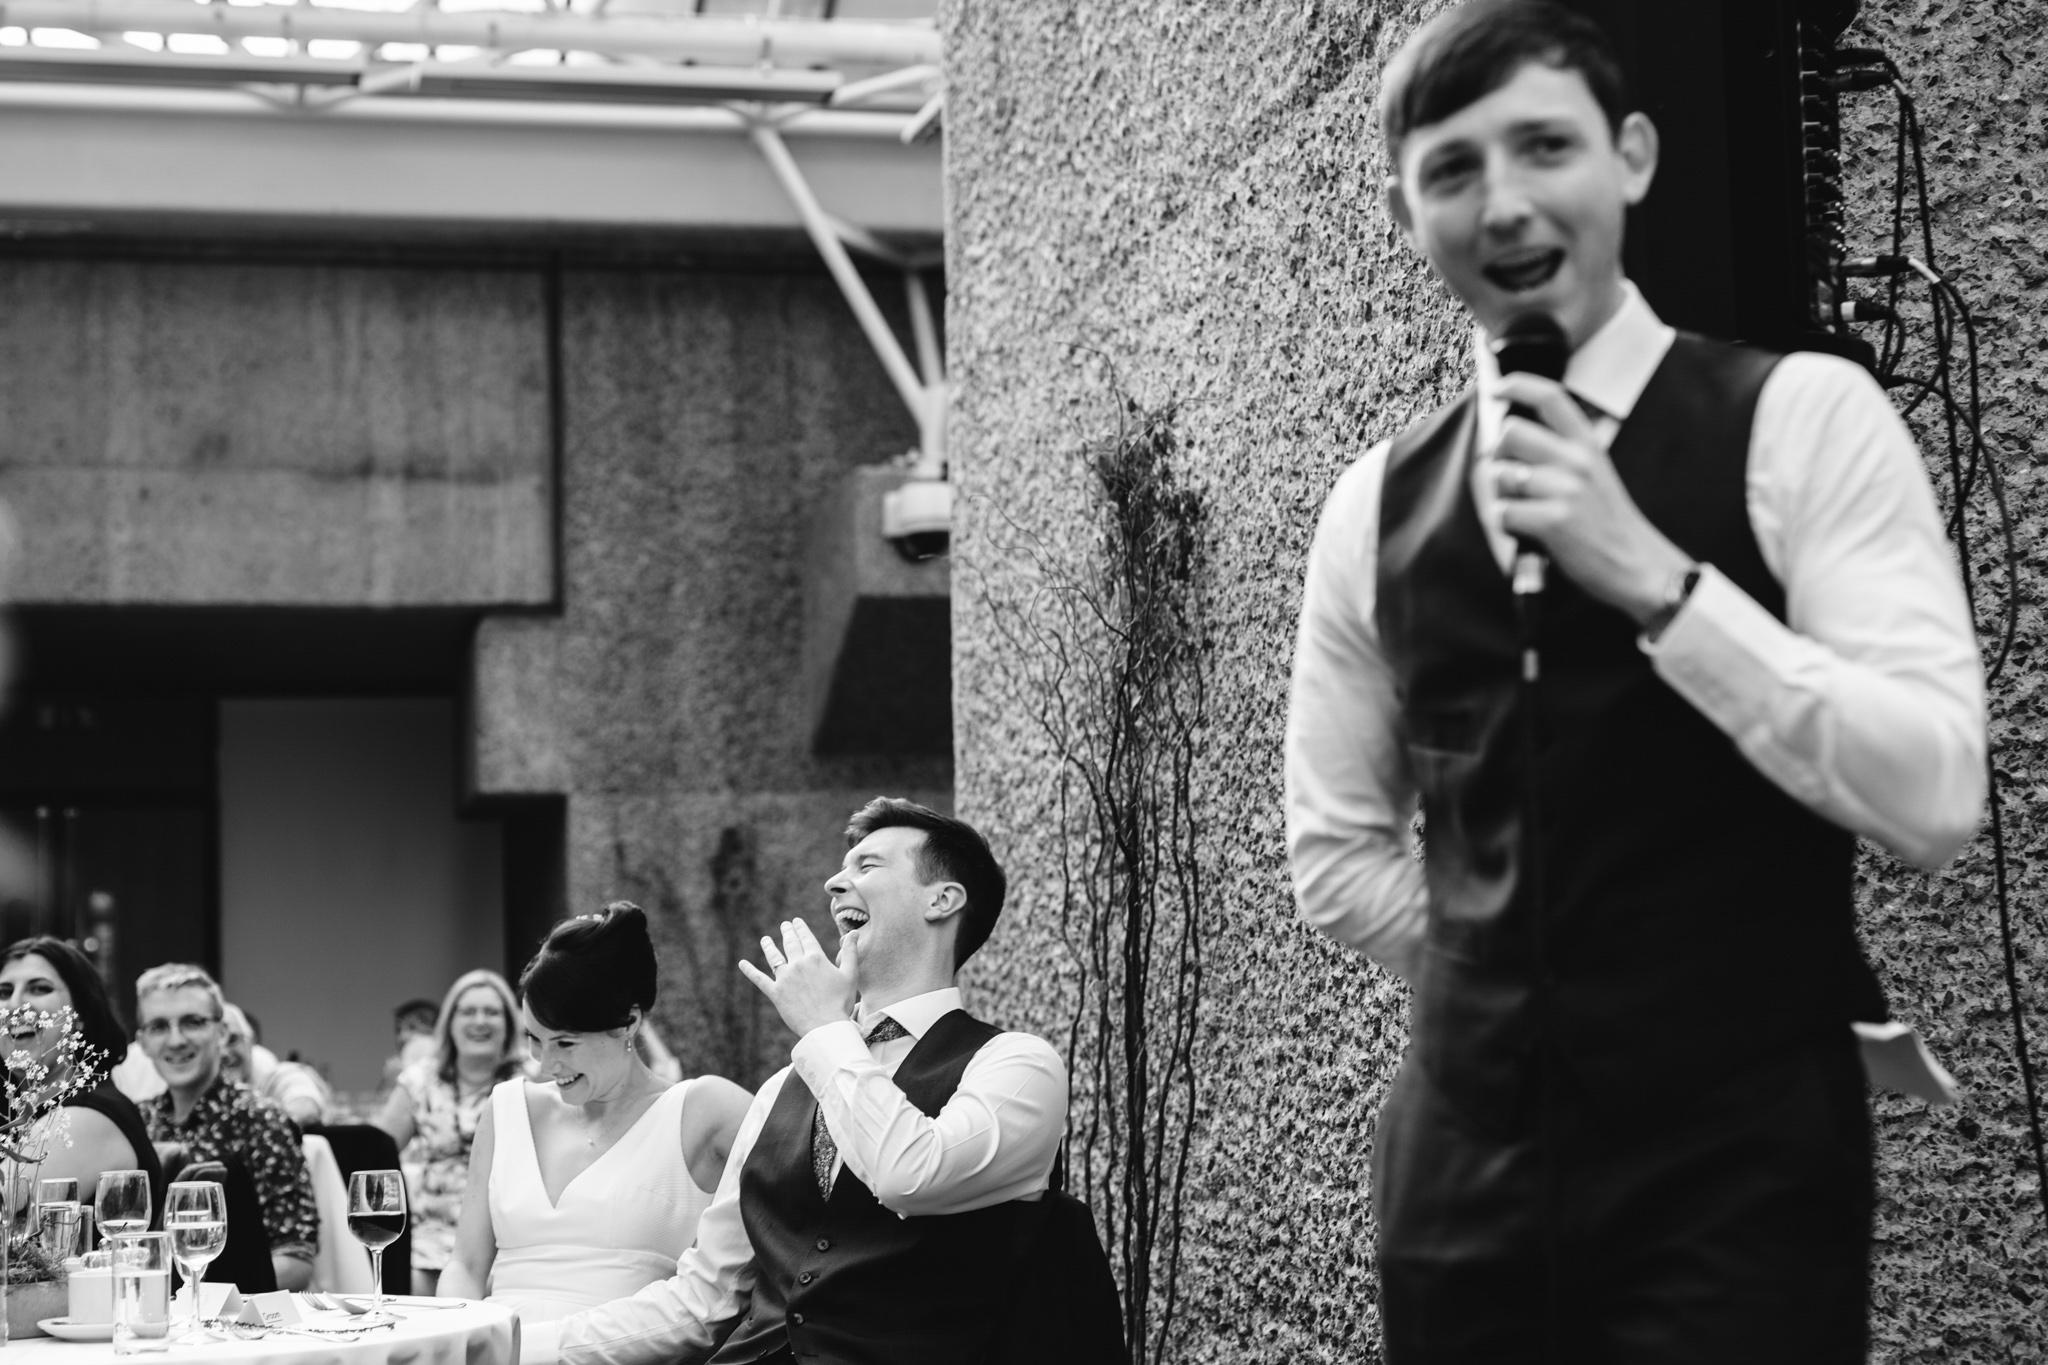 derbyshire-wedding-photographer-videographer-camera-hannah-49.jpg